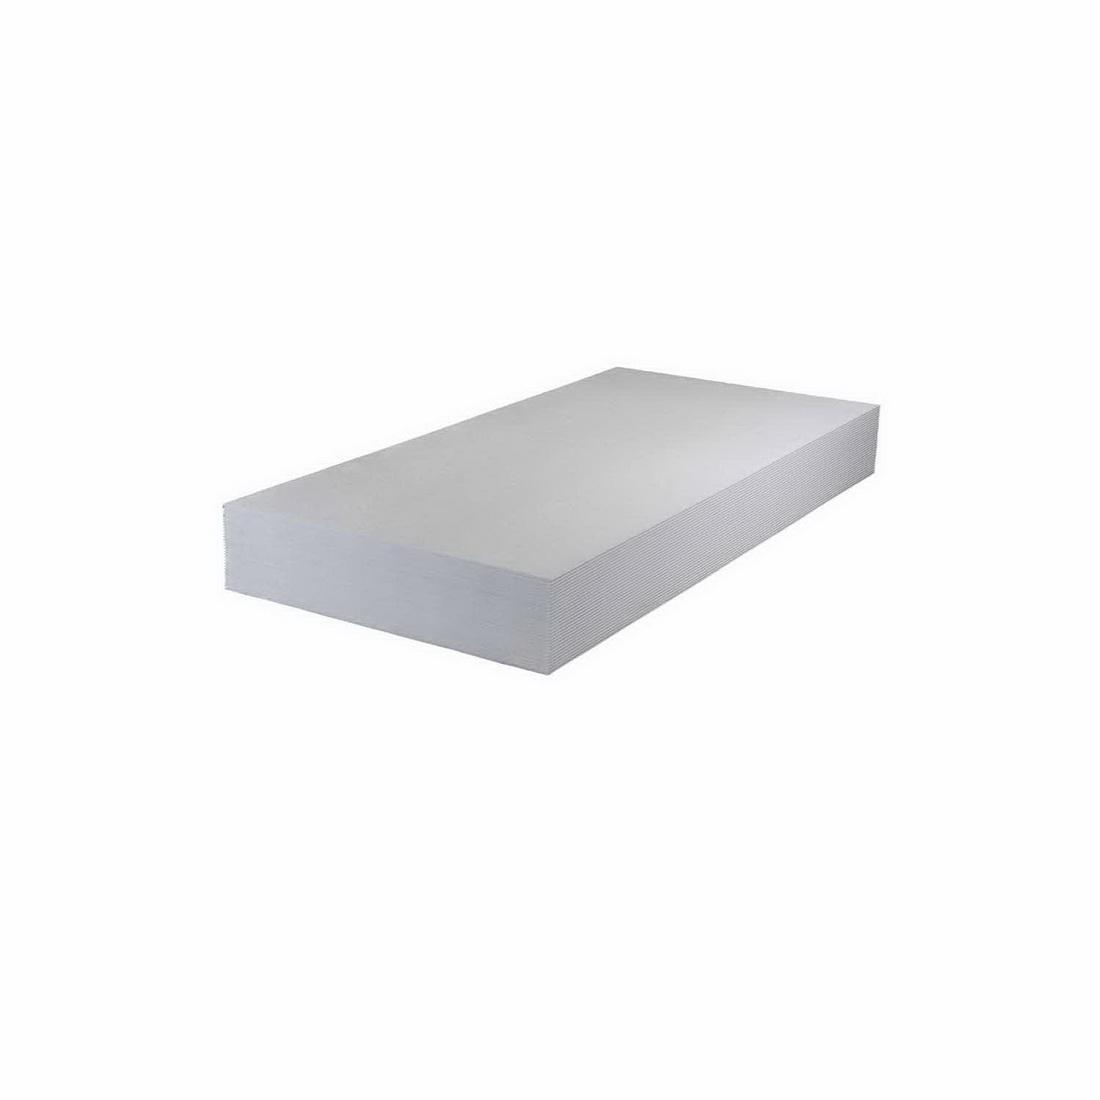 EasyLap Panel 9mm 2450 x 1200mm